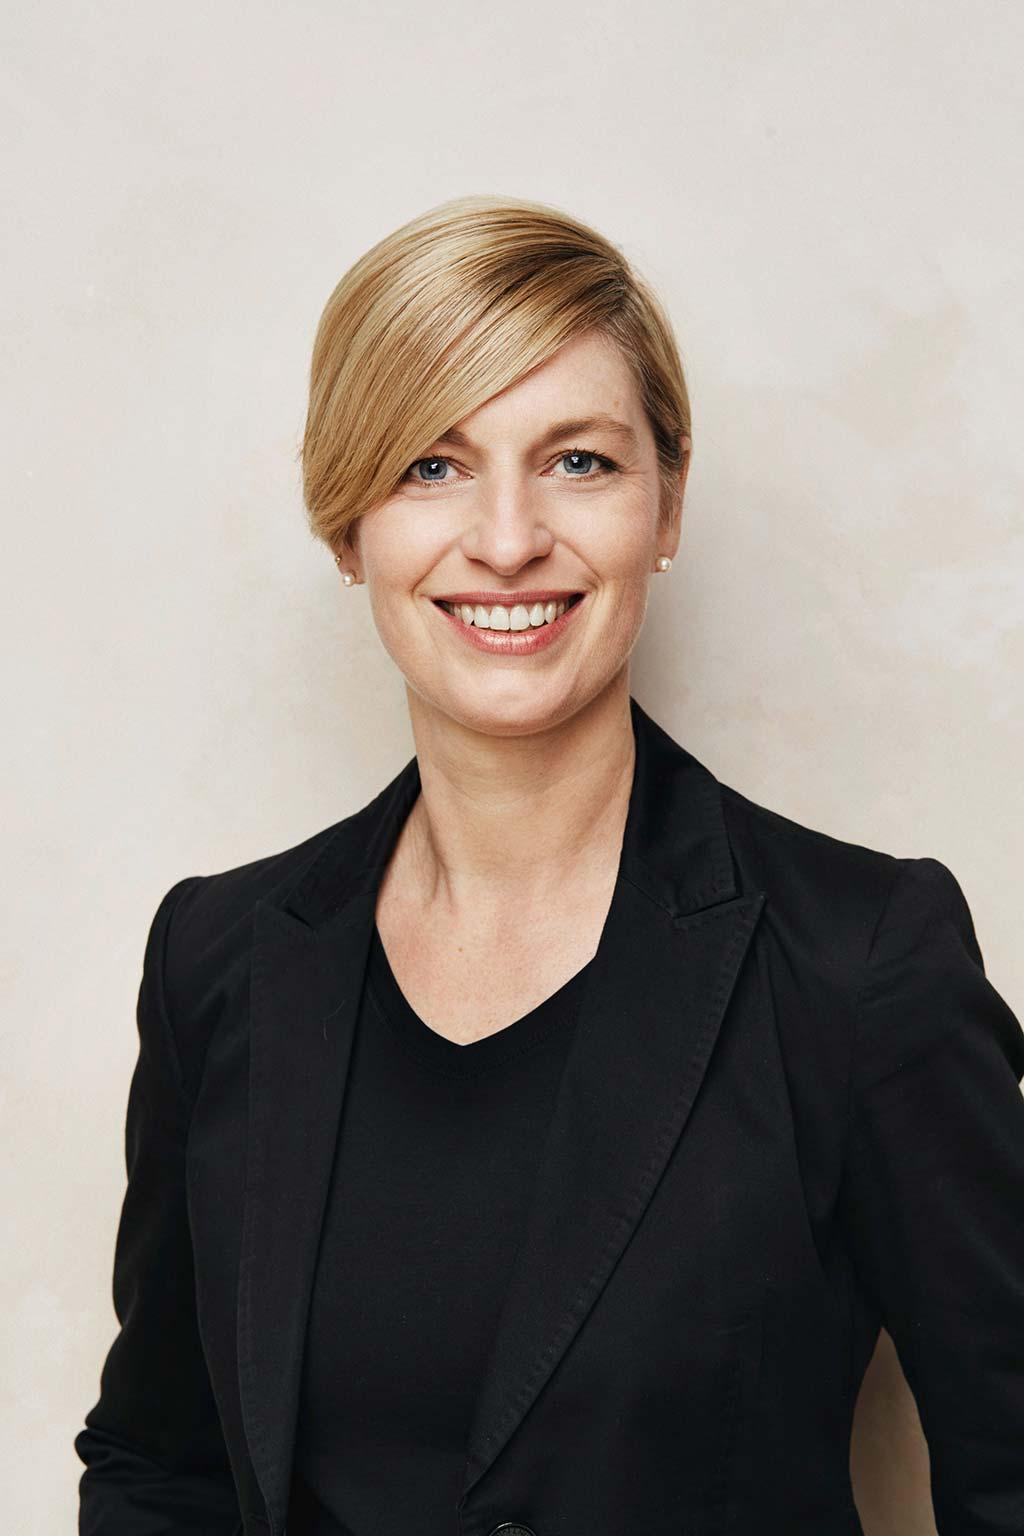 Susanne Mappes - Initiatorin der Bundesinitiative Mietvorsorge